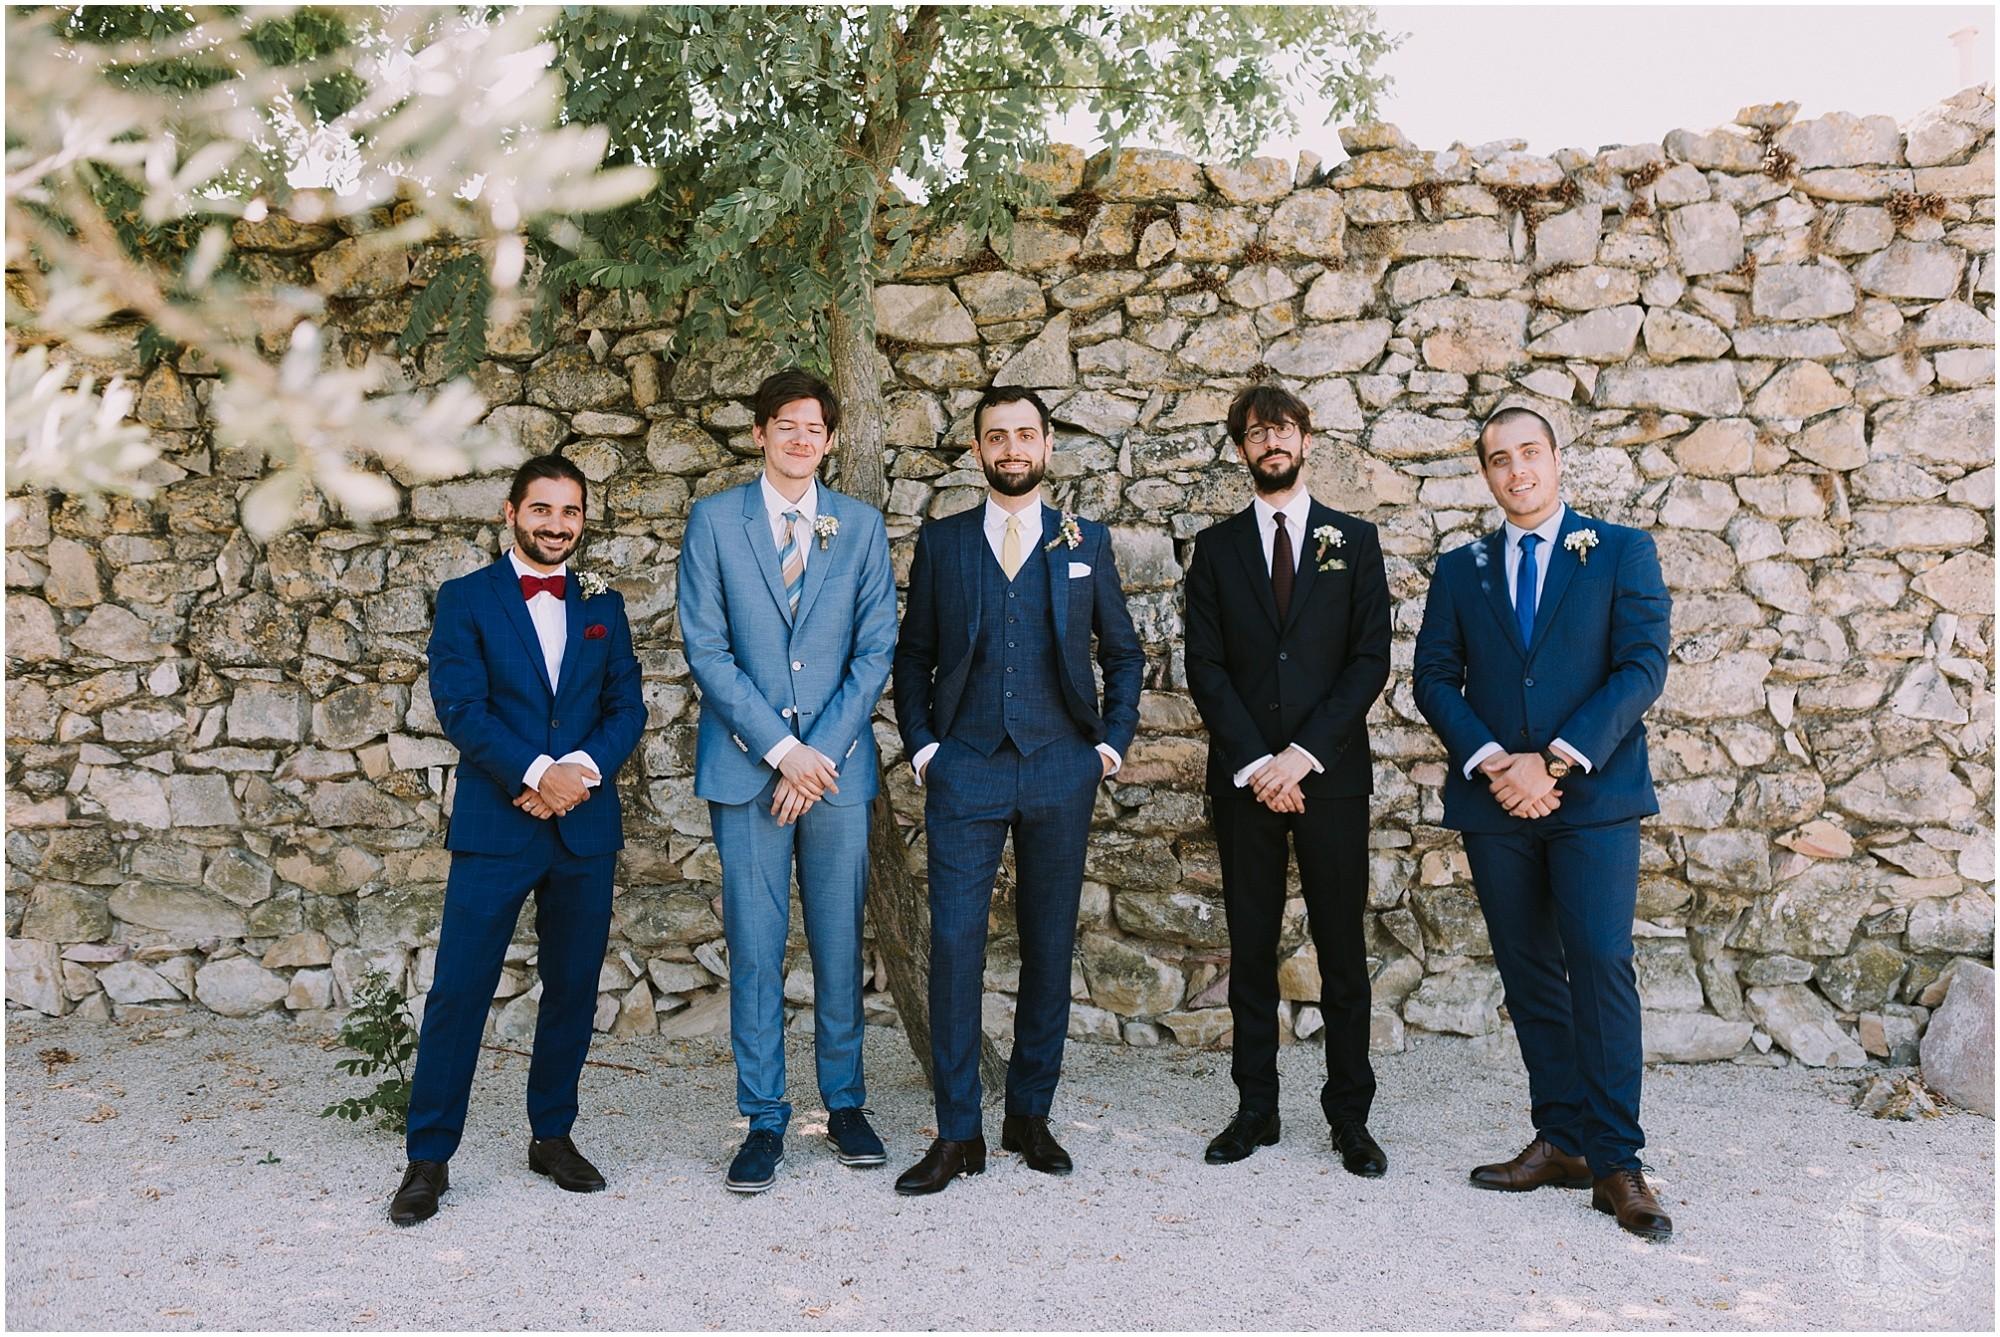 Kateryna-photos-photographe-mariage-vaucluse-provence-avignon-ferme-st-hugues_0008.jpg